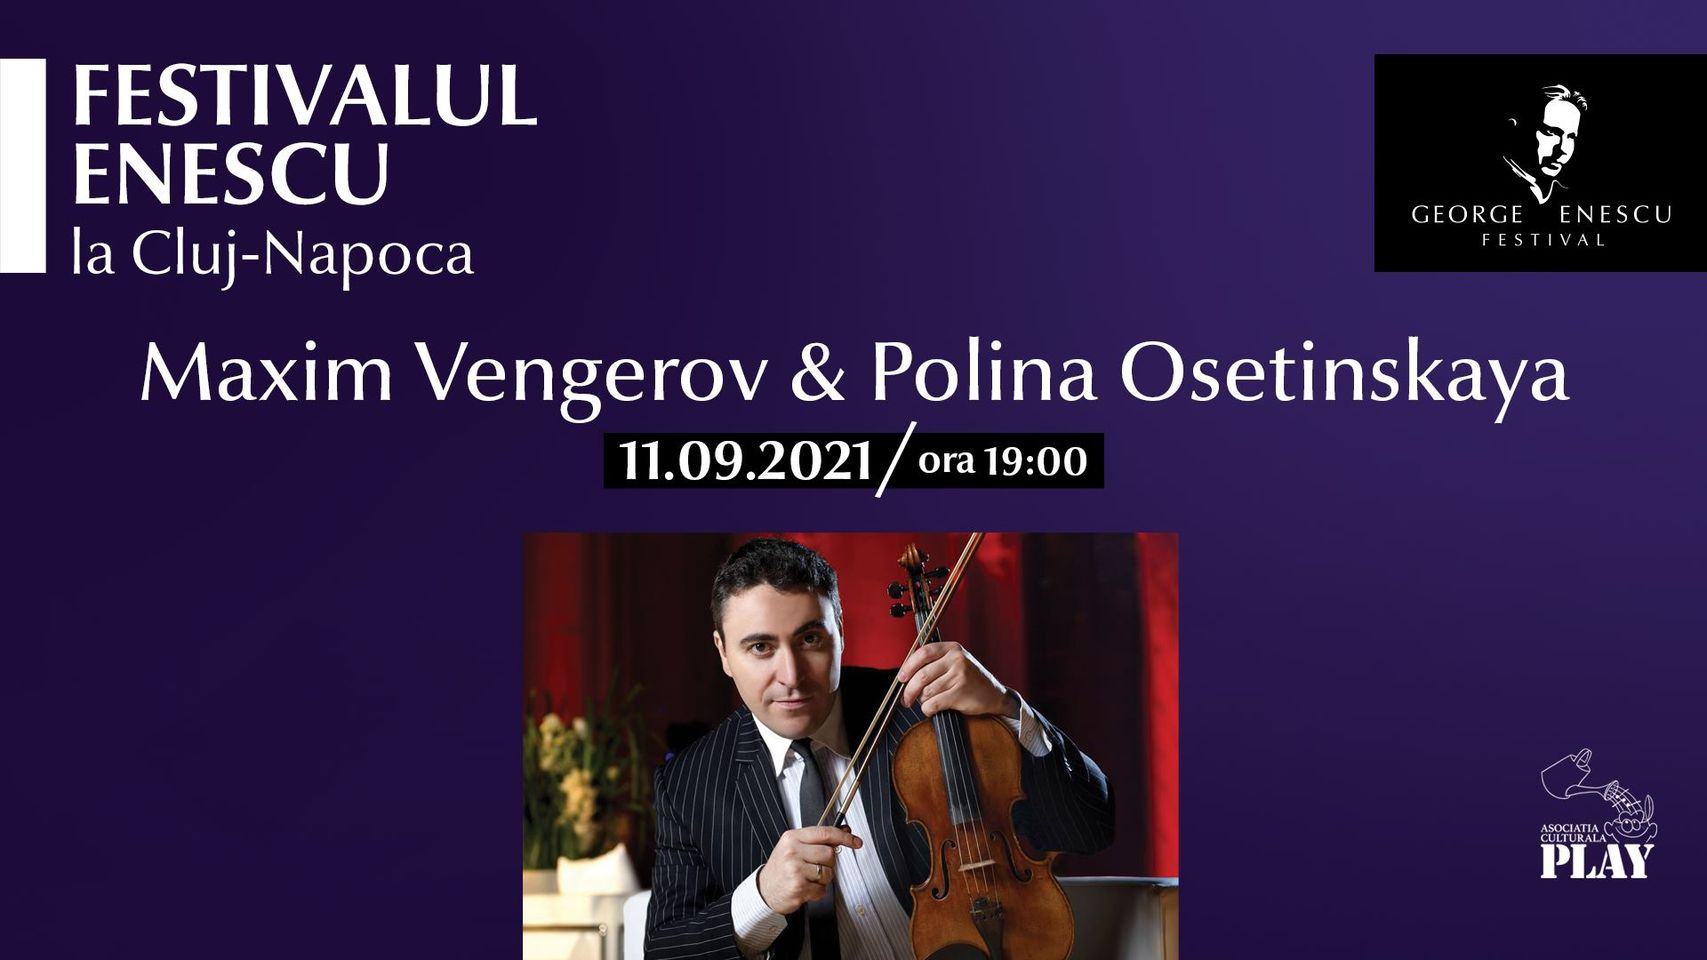 Recital Maxim Vengerov & Polina Osetinskaya ✦ Festivalul Enescu la Cluj-Napoca